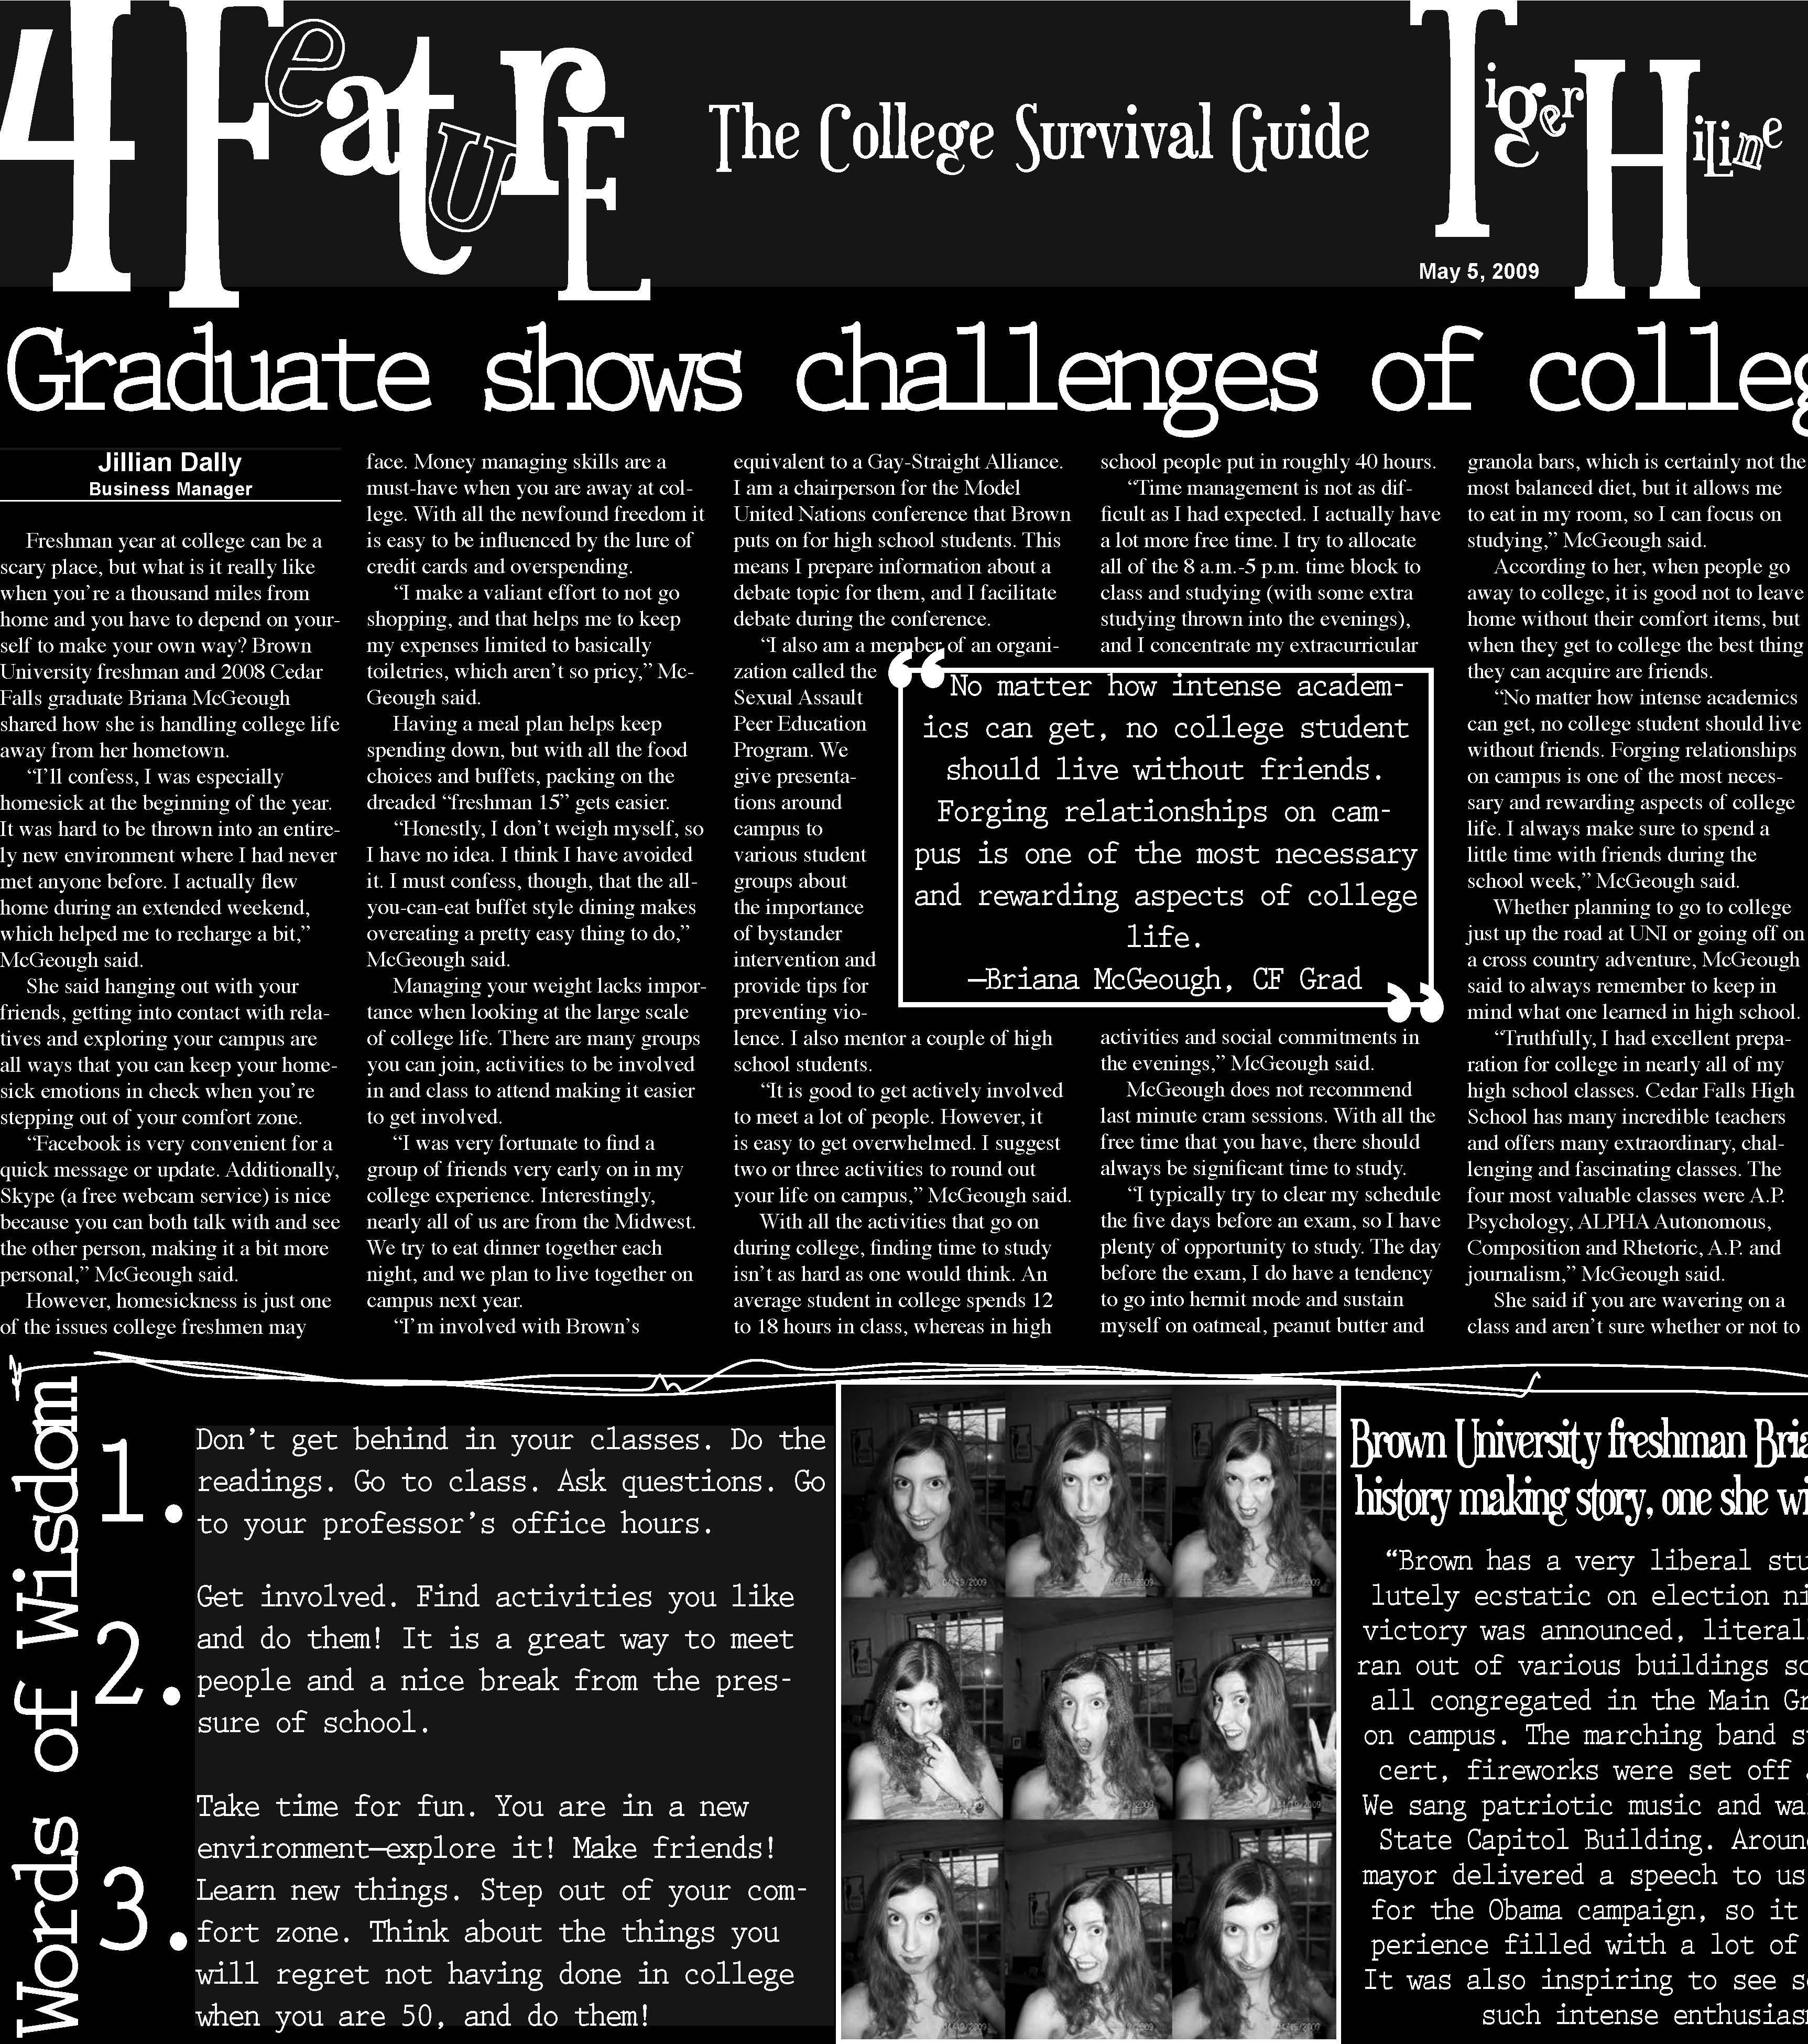 dally.graduate_Page_1